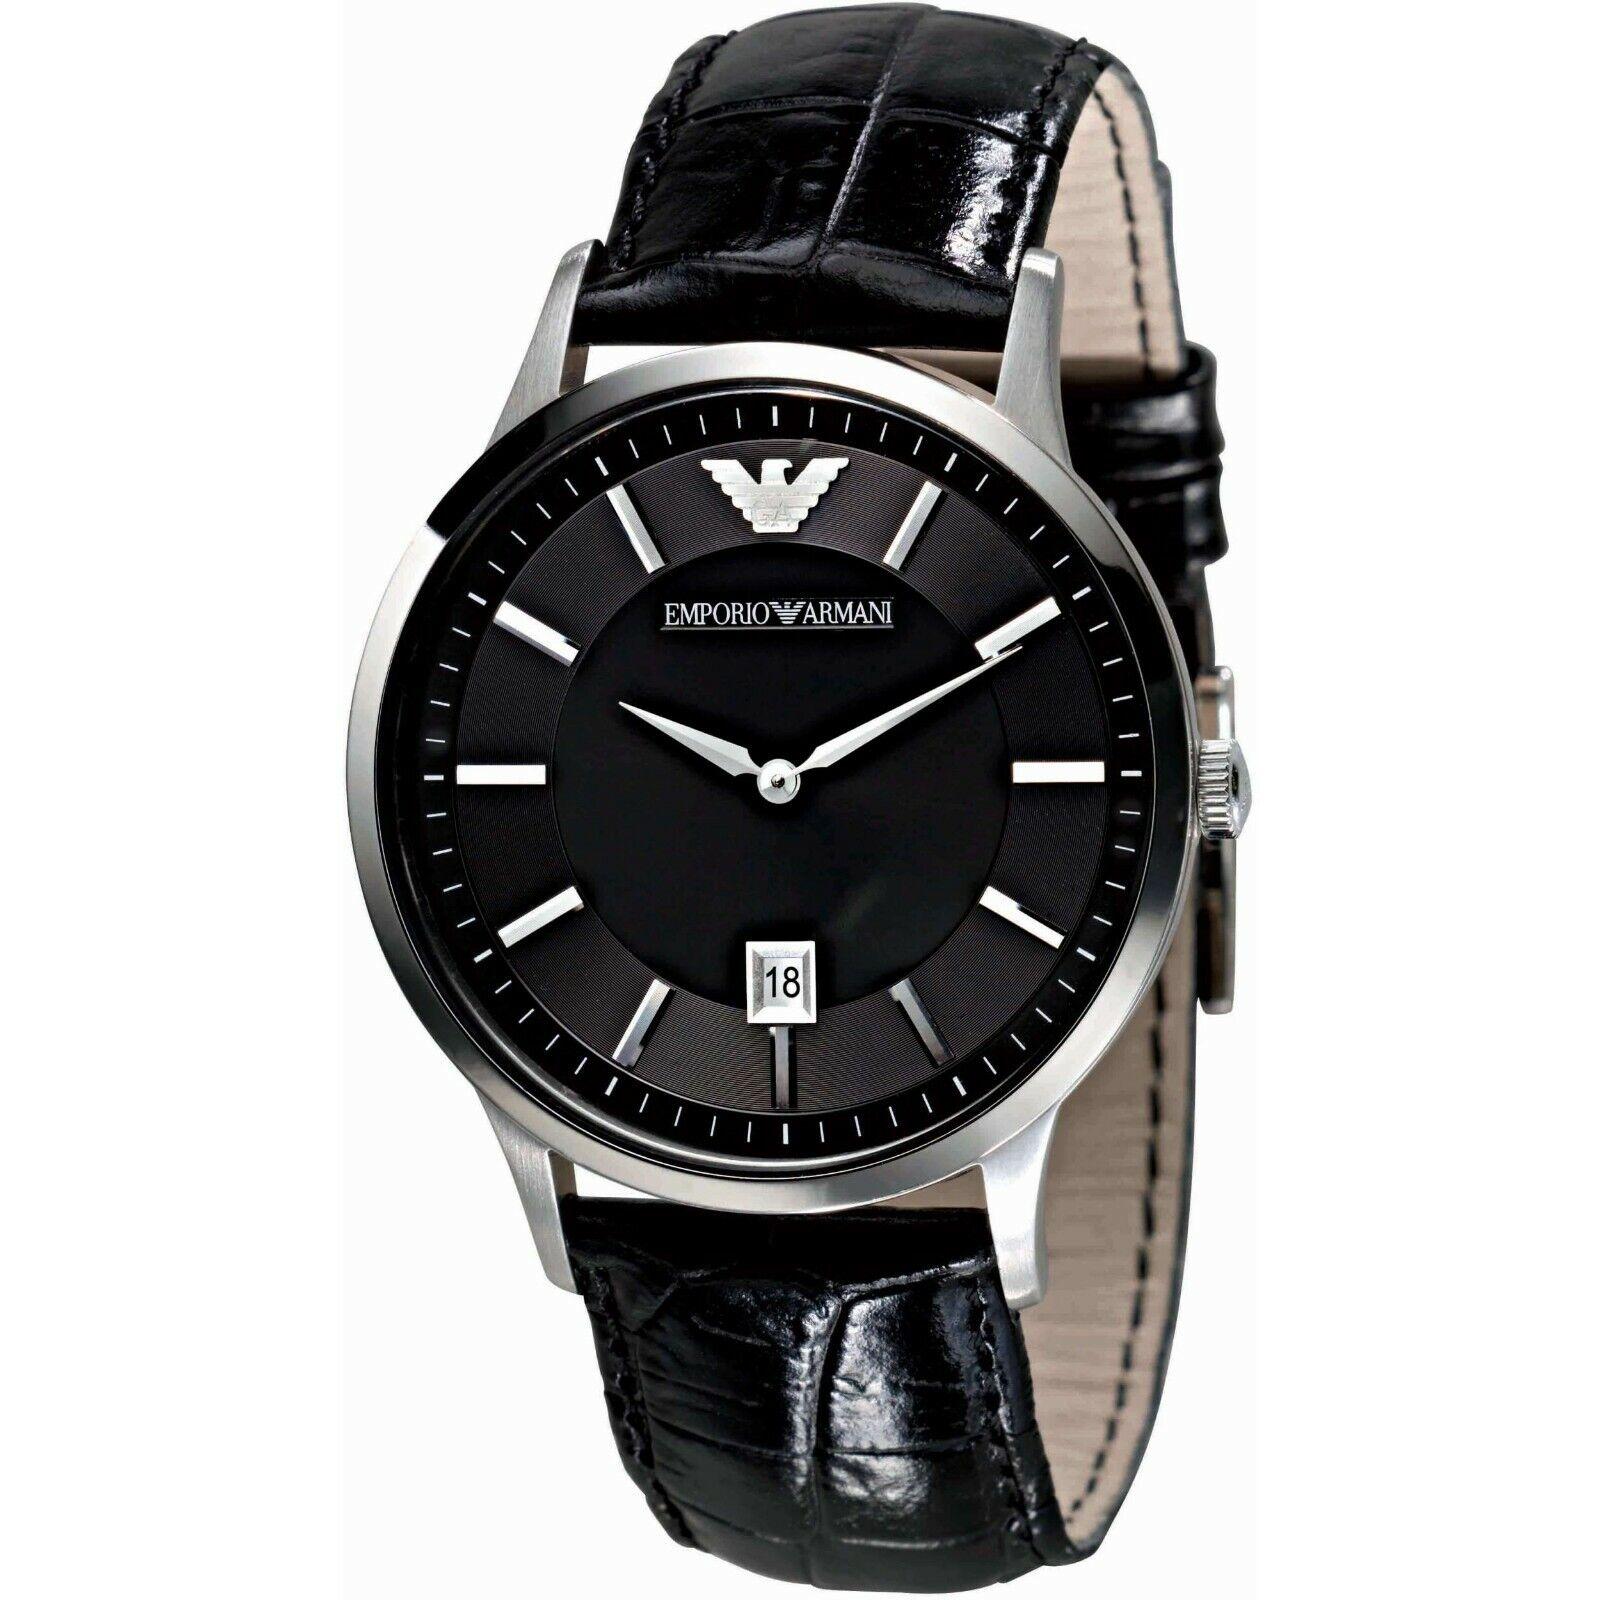 20133b8a9ba Emporio Armani AR2411 Men s Black Leather Strap Watch for sale ...